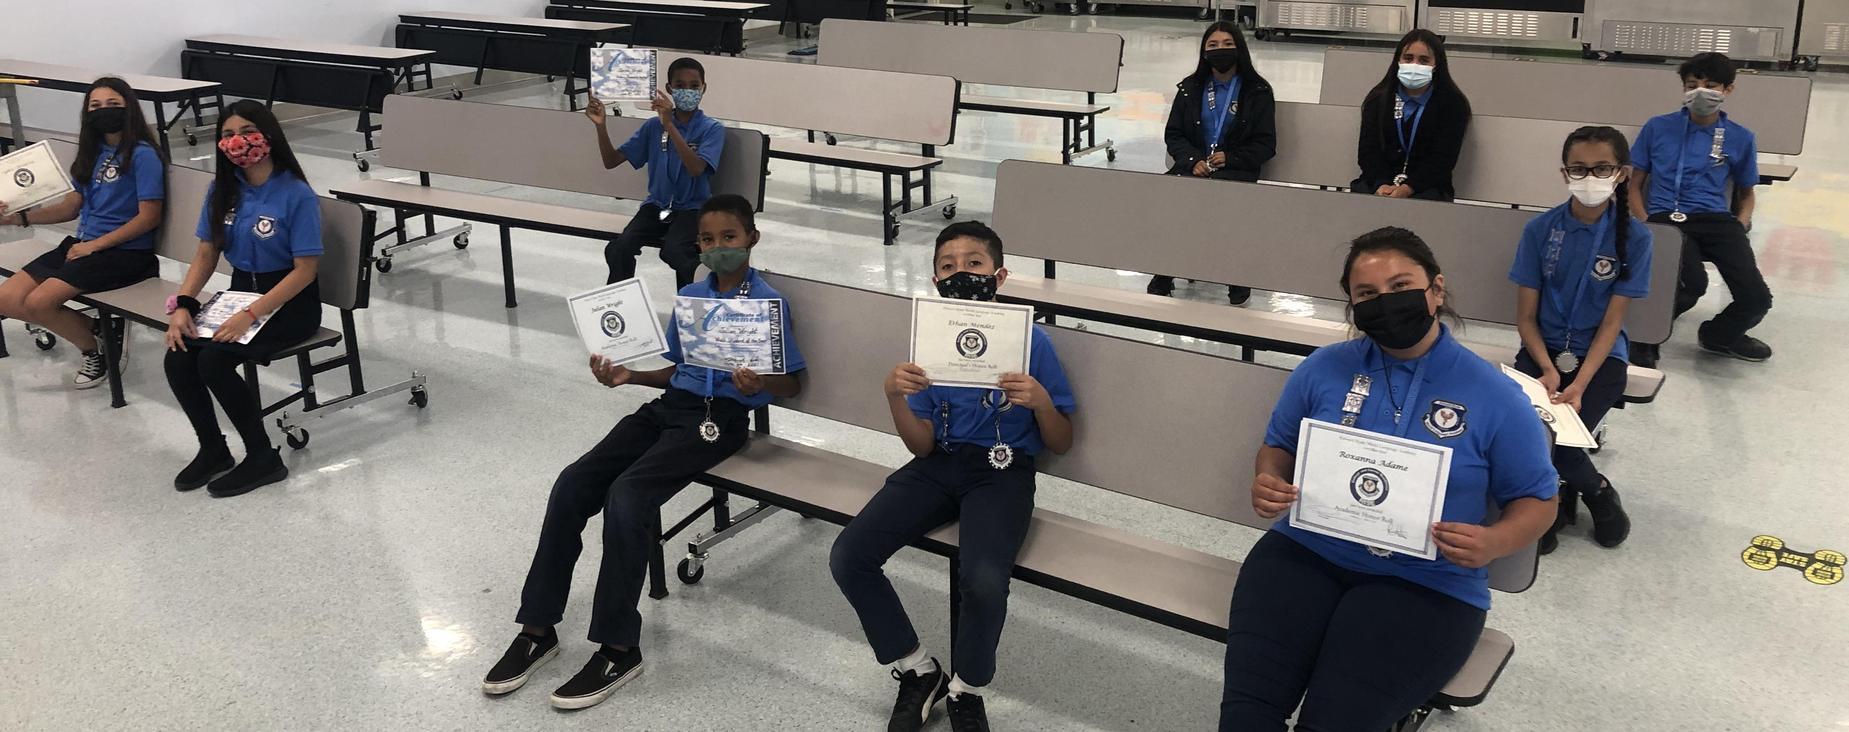 students sitting displaying certificates